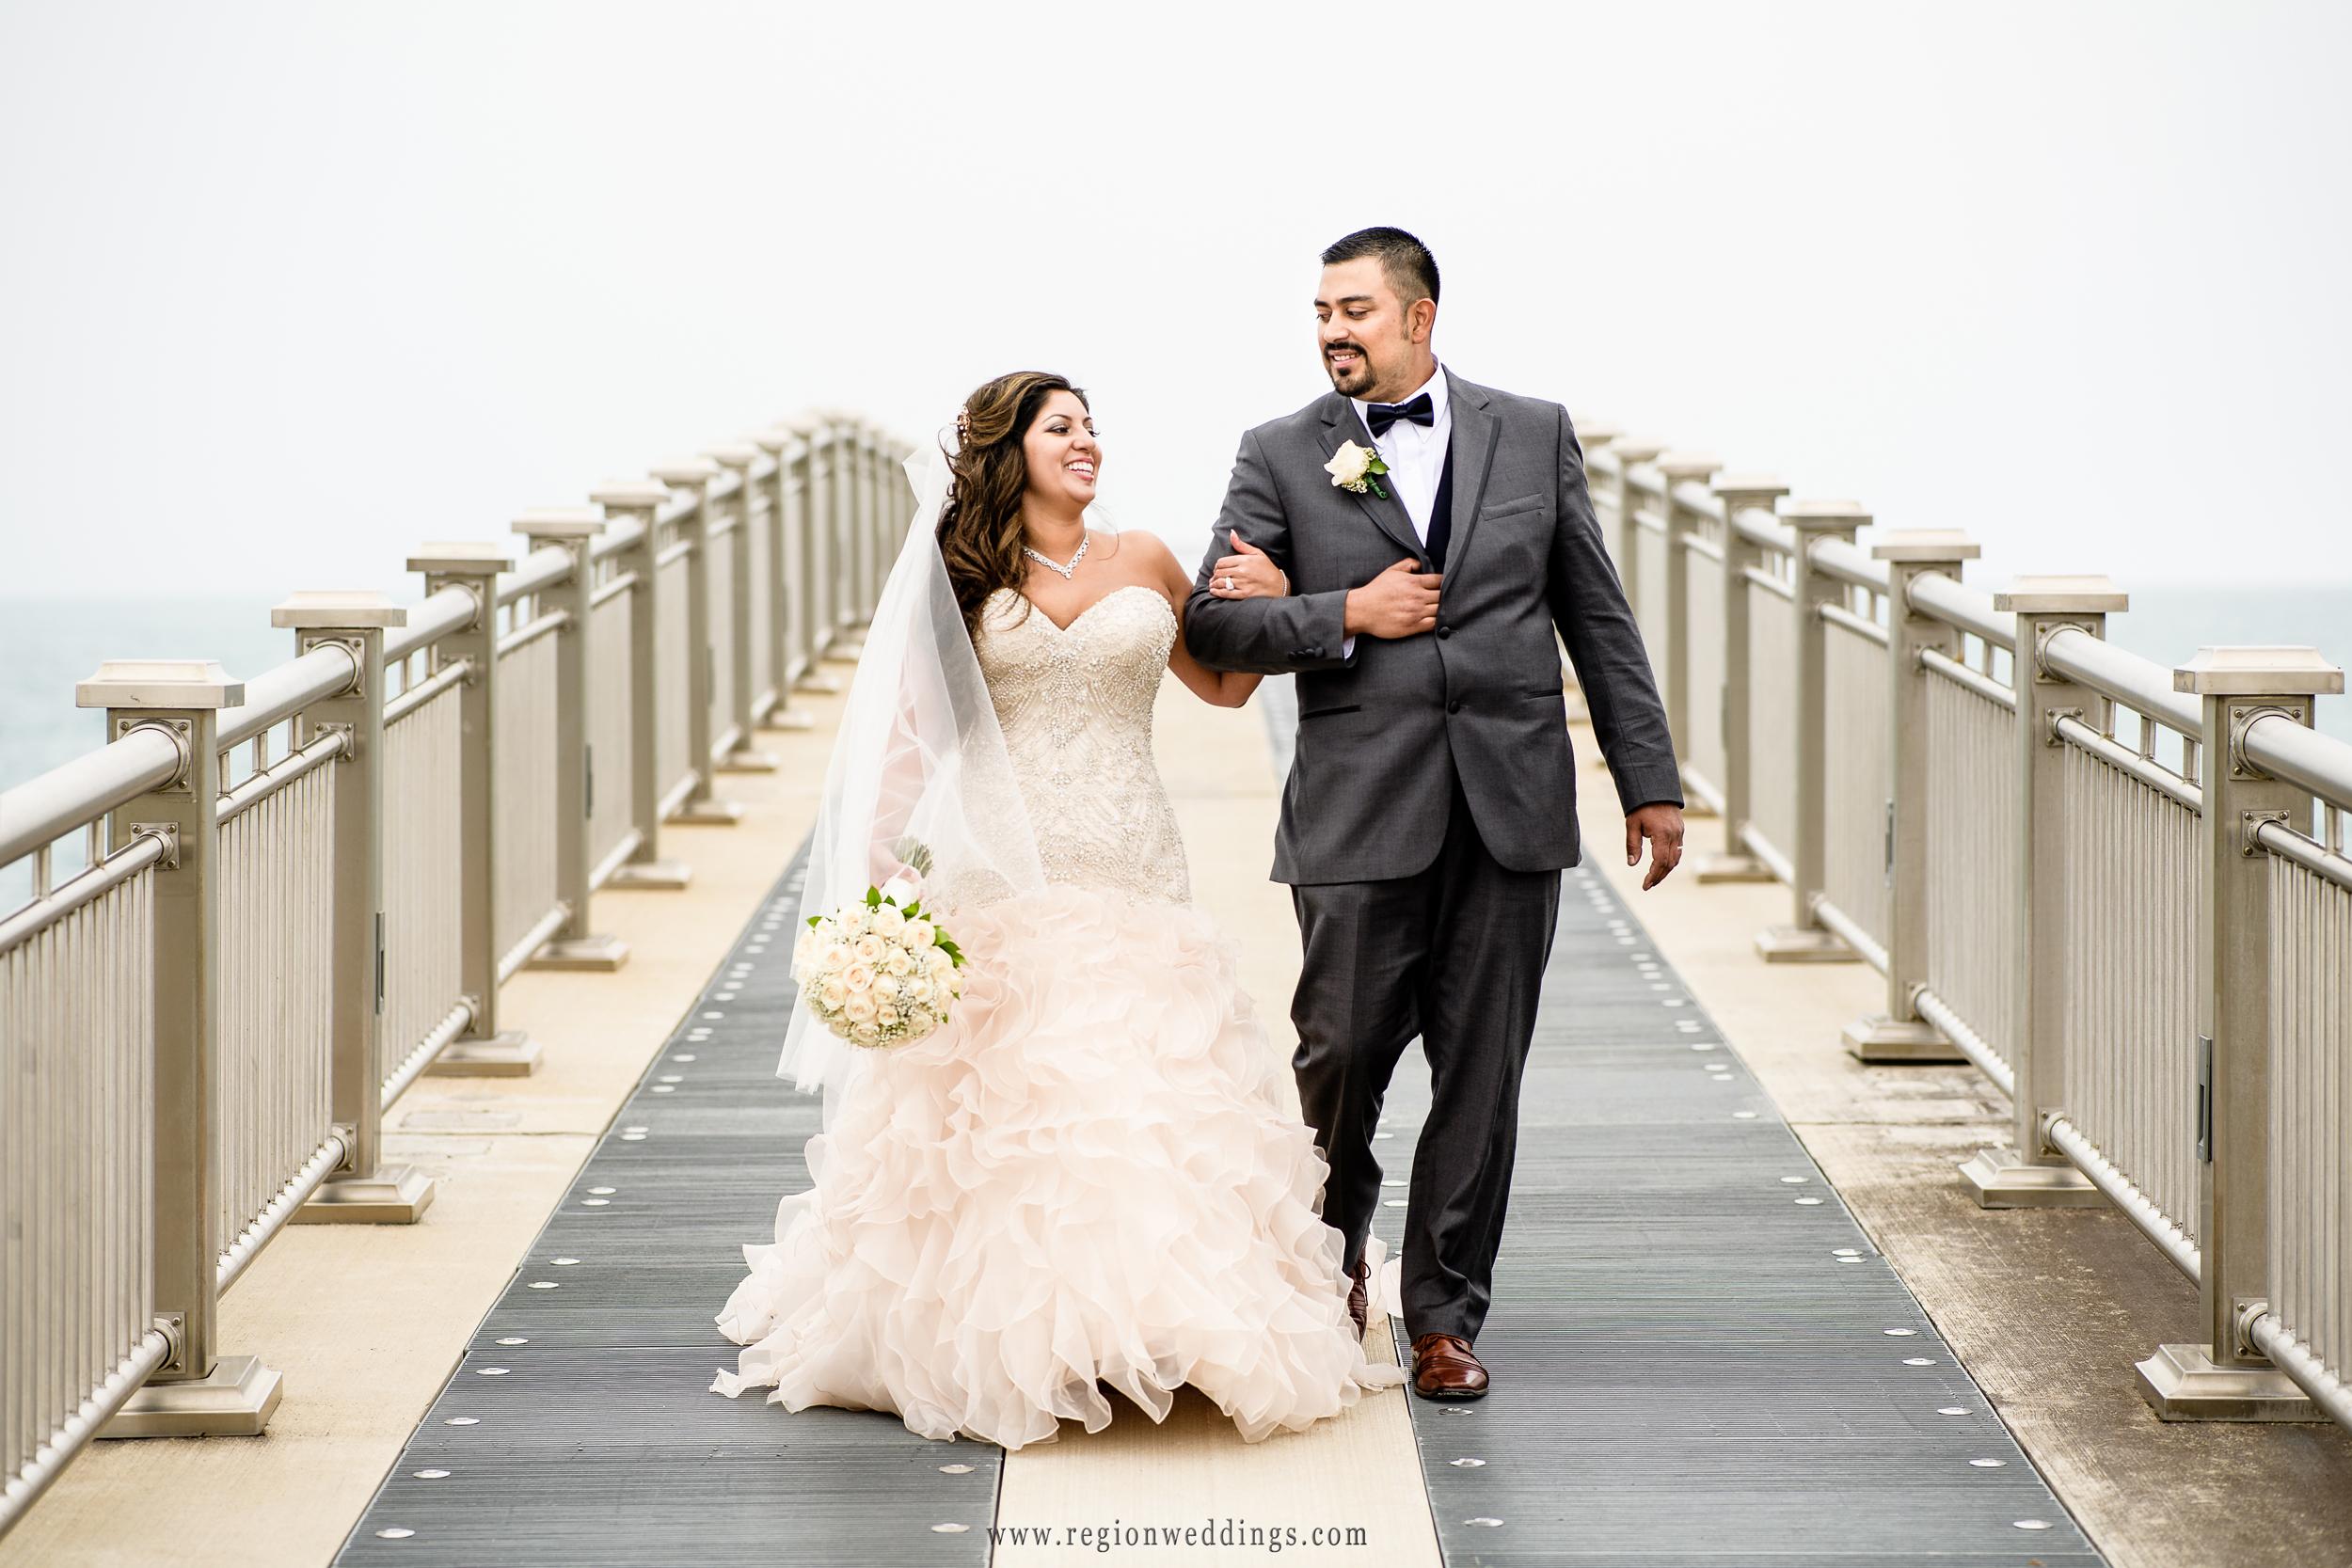 The groom escorts his bride along the pier.